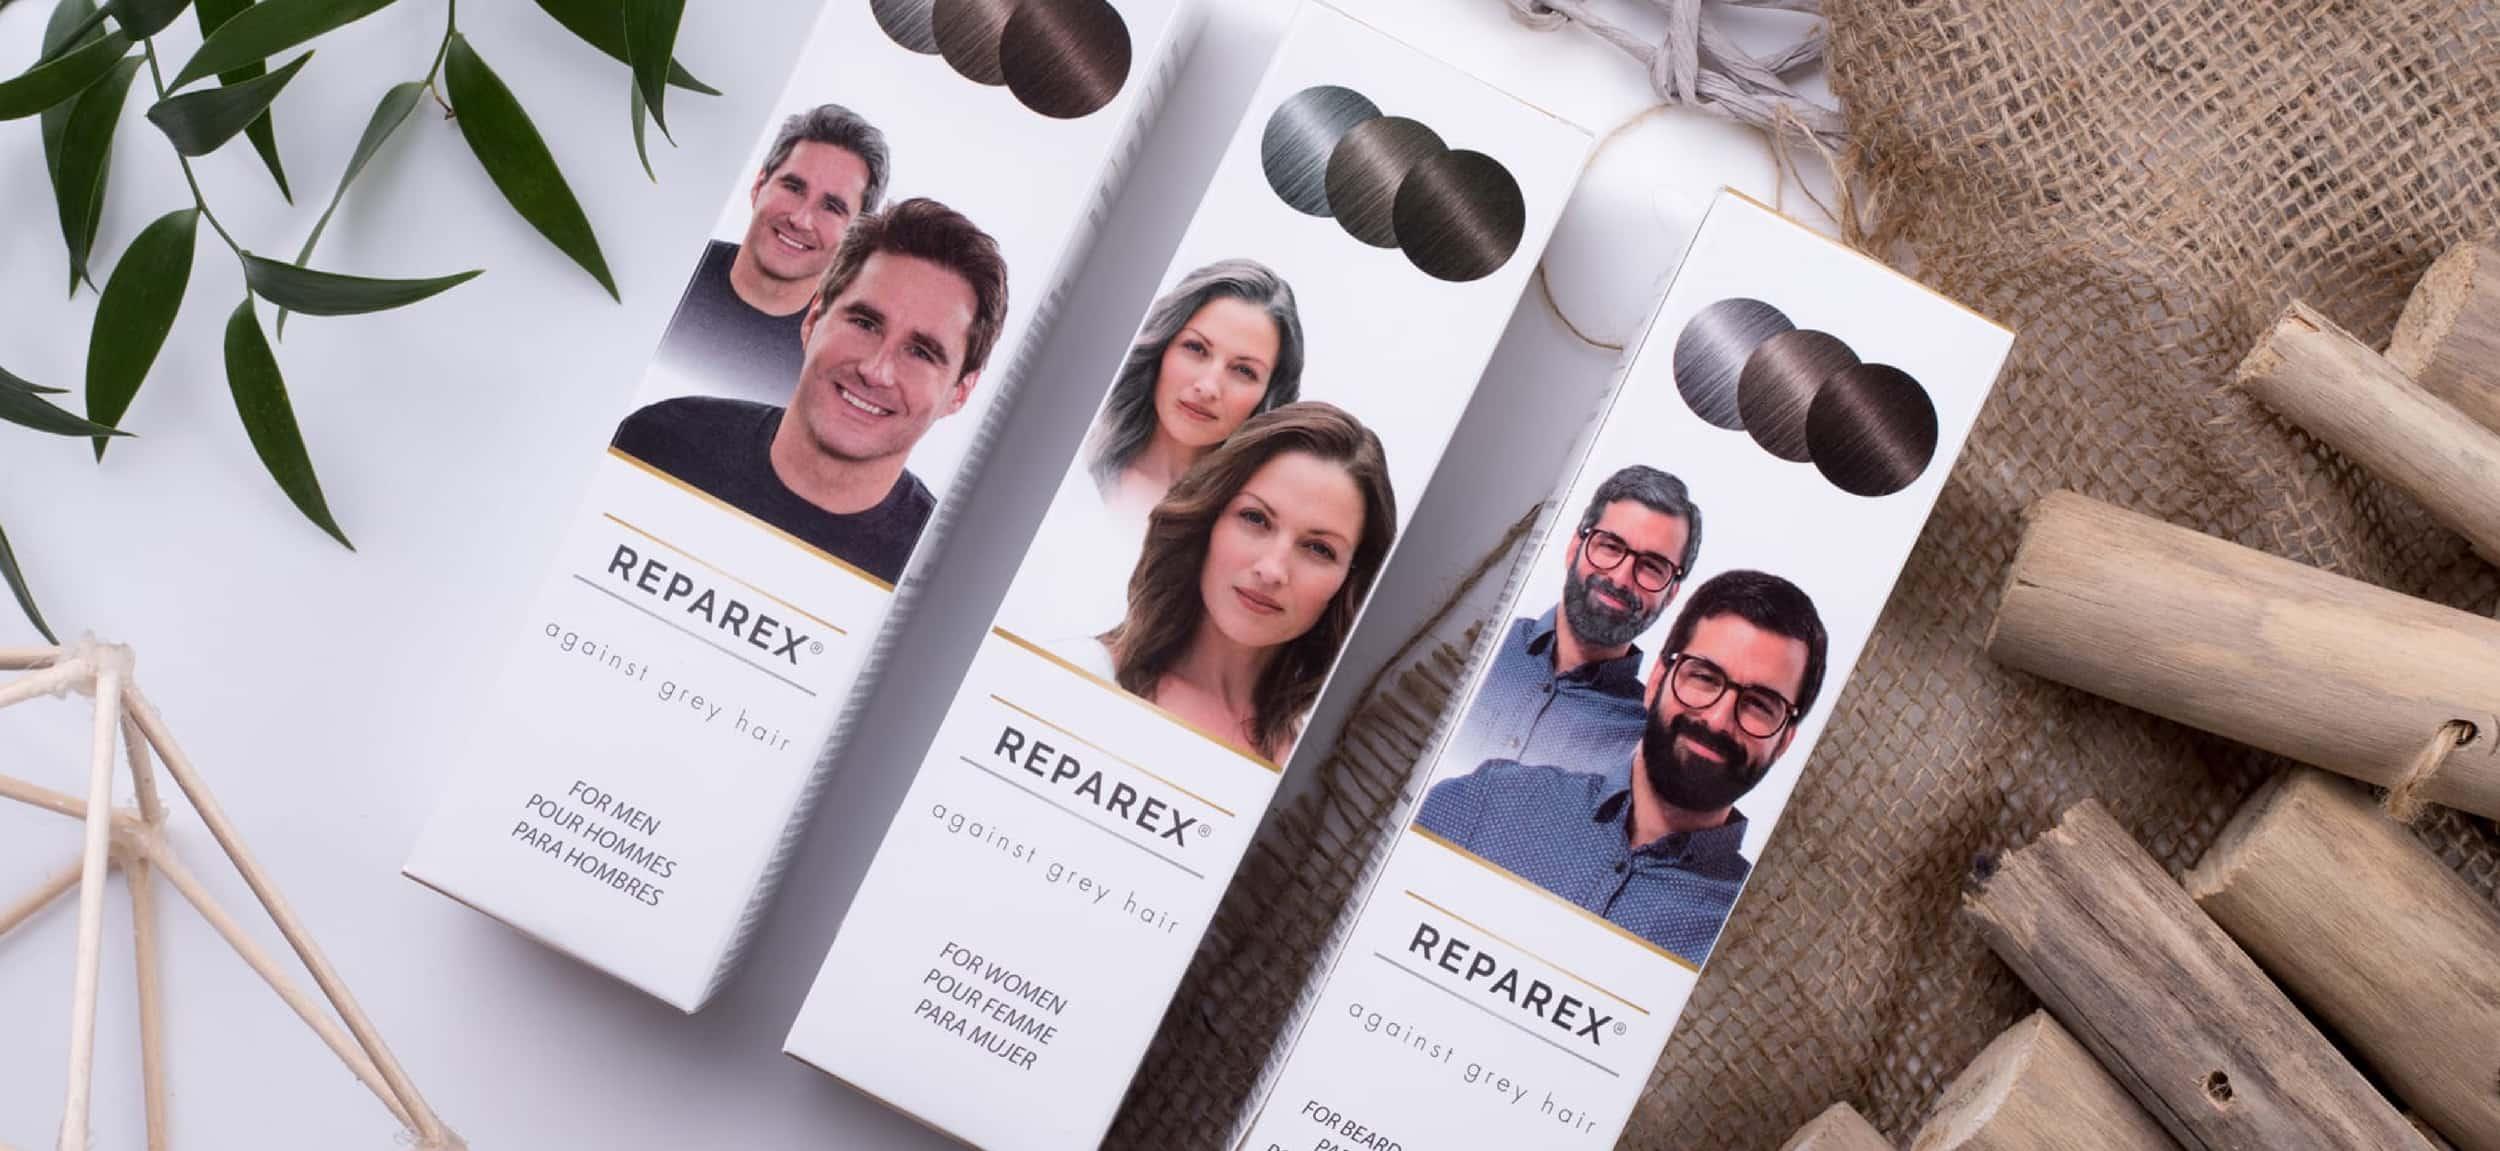 reparex-against-grey-hair-banner